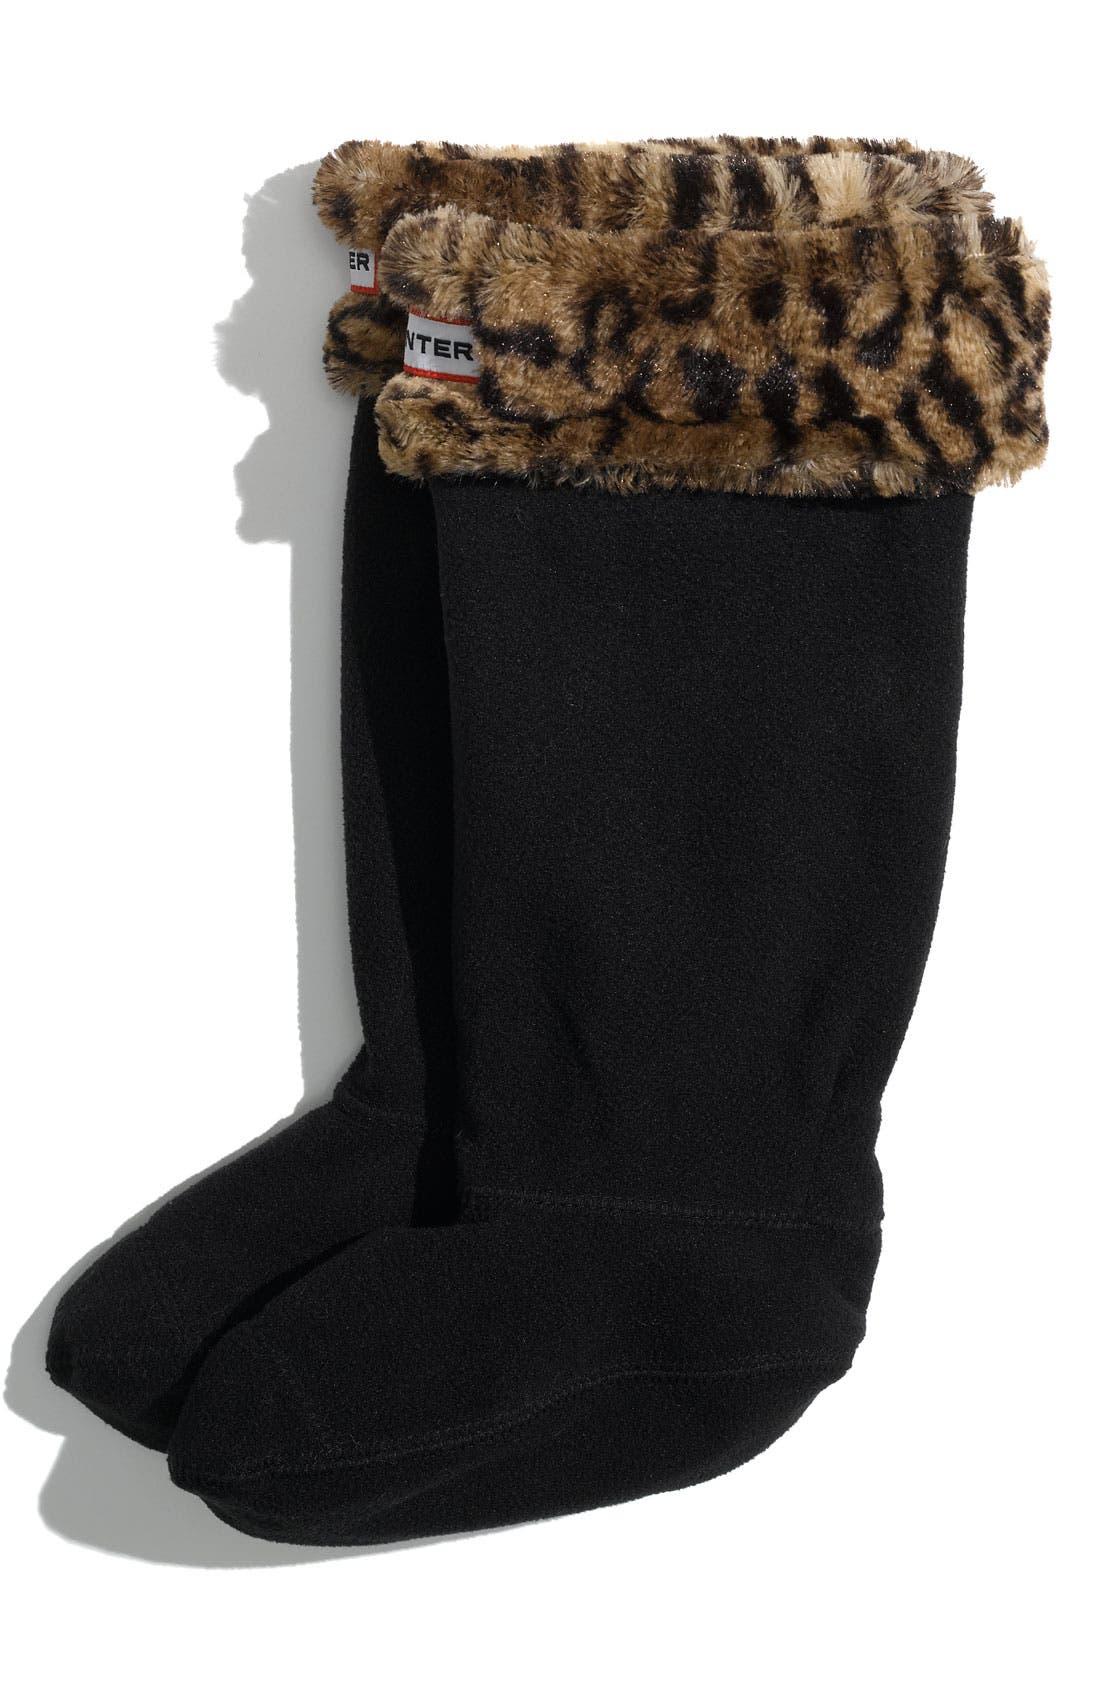 Alternate Image 1 Selected - Hunter Patterned Fleece Welly Socks (Toddler, Little Girls & Big Girls)